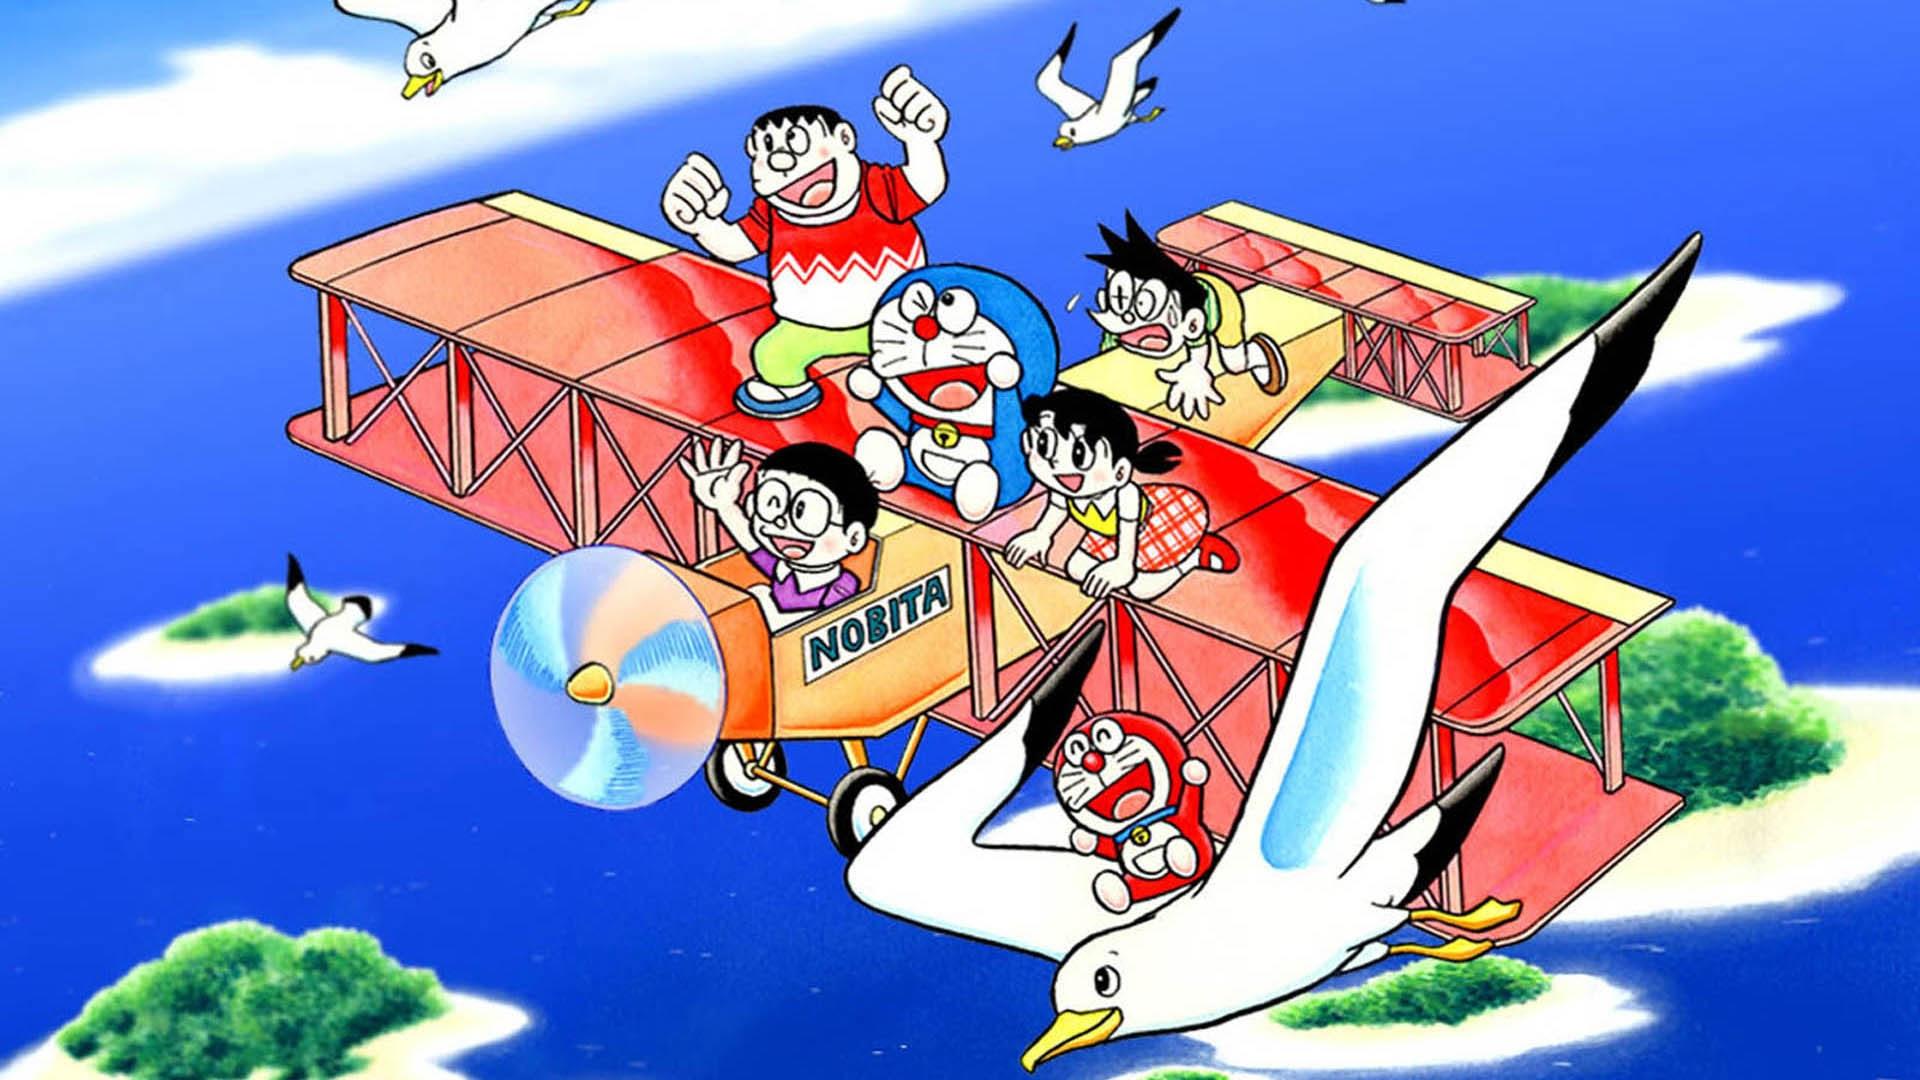 700 Wallpaper Animasi Doraemon Bergerak HD Gratis